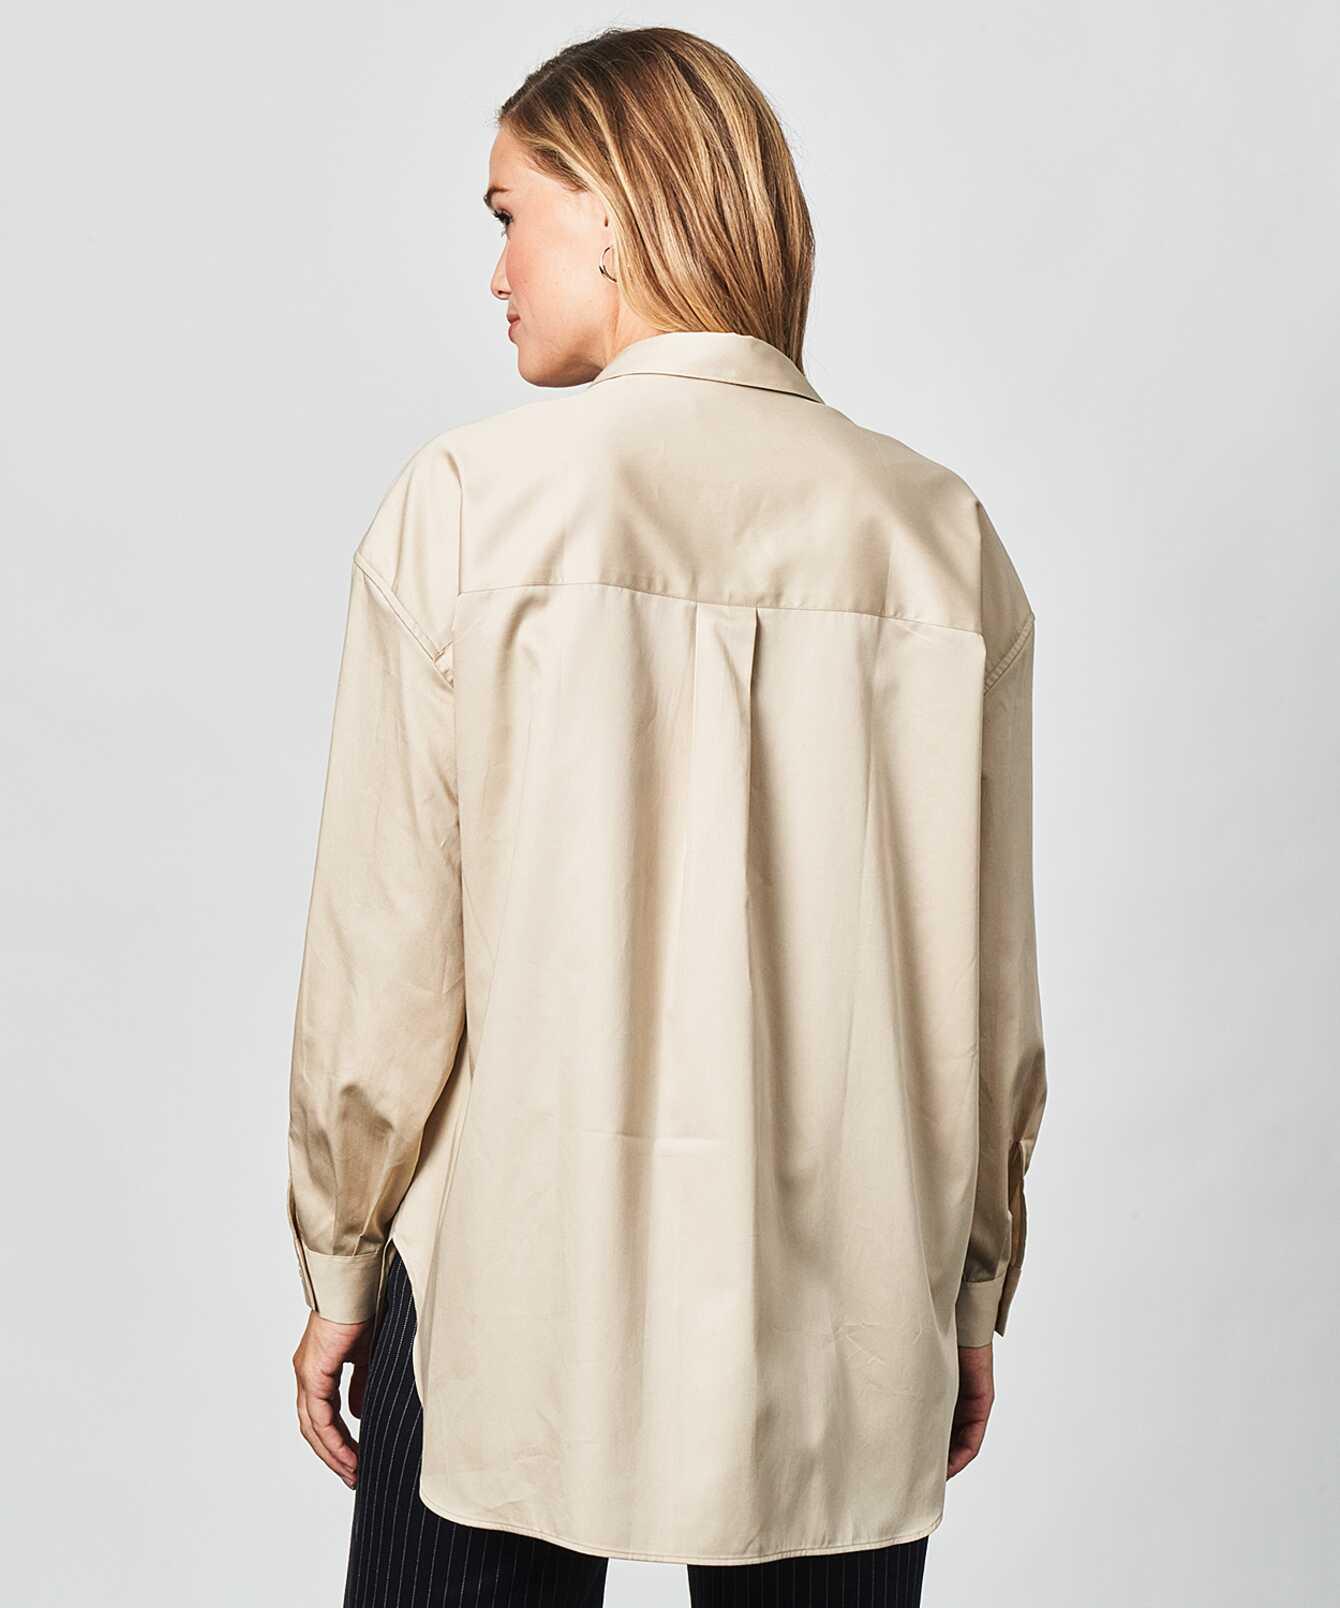 Skjorta Elsa Cotton Poplin Beige The Shirt Factory